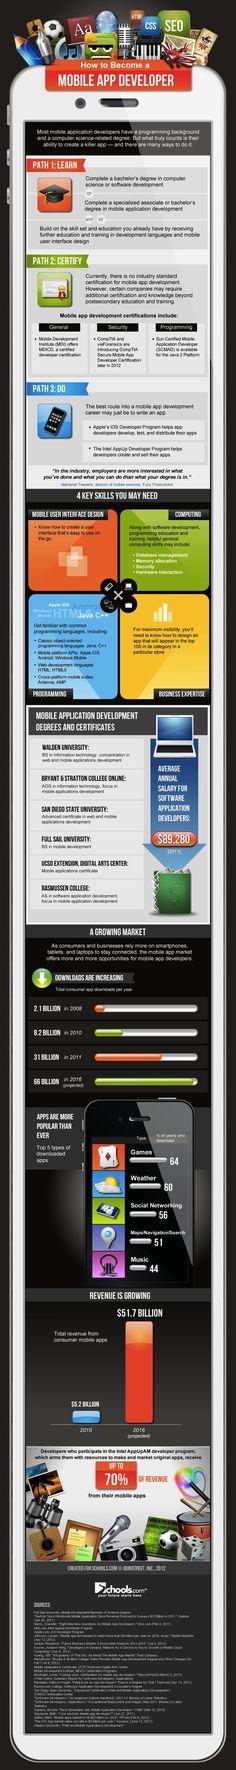 How to Become a Mobile App Developer #mobileapp #appdeveloper